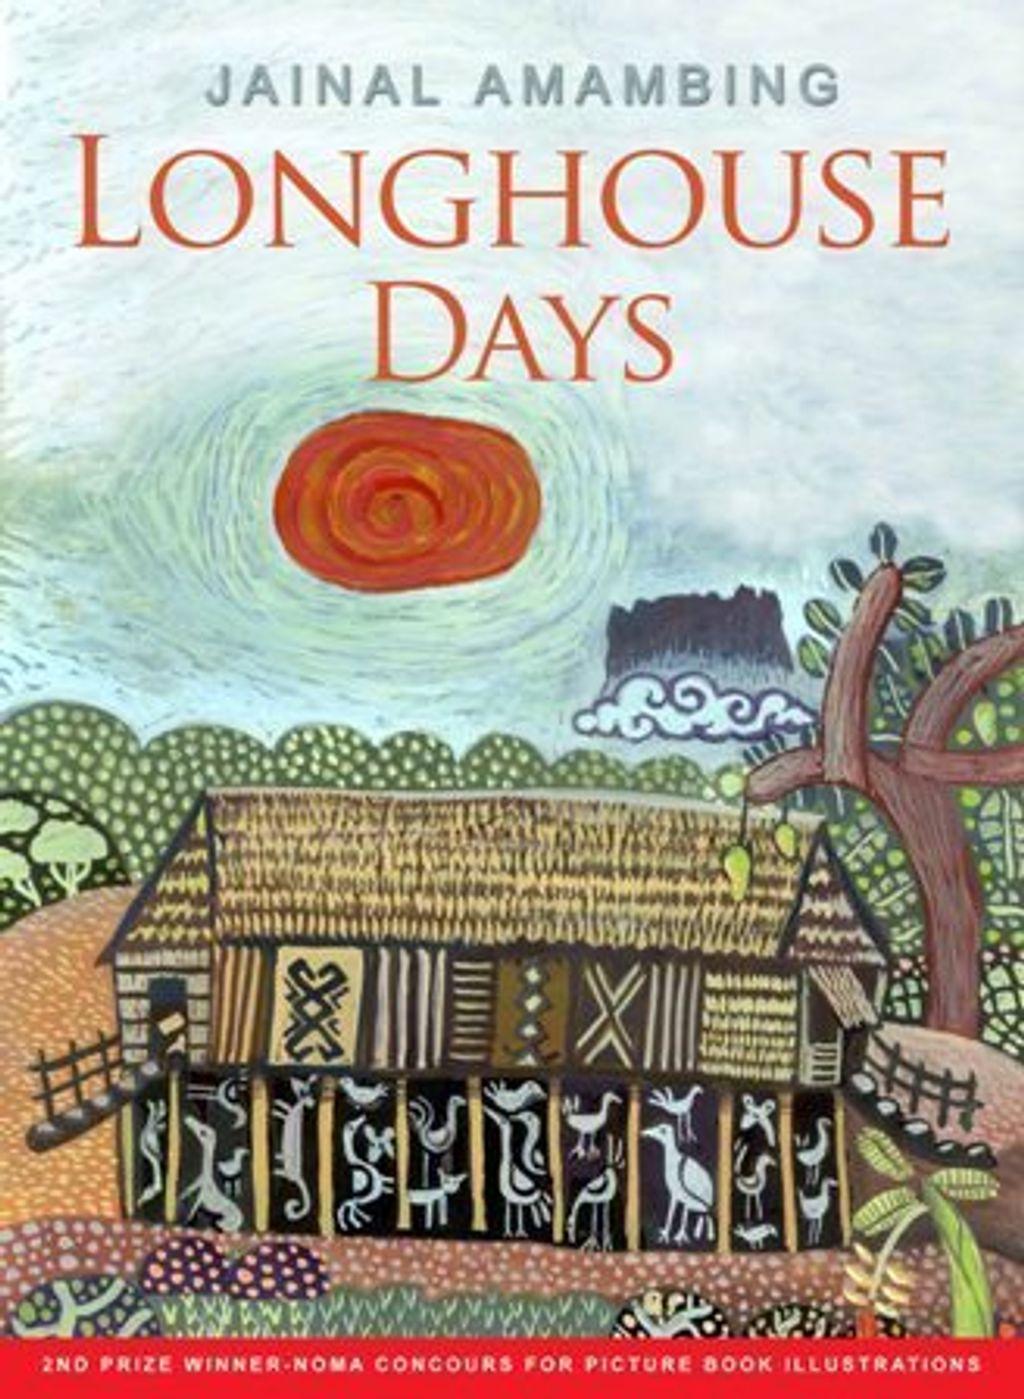 Longhouse Days_Cover.jpg